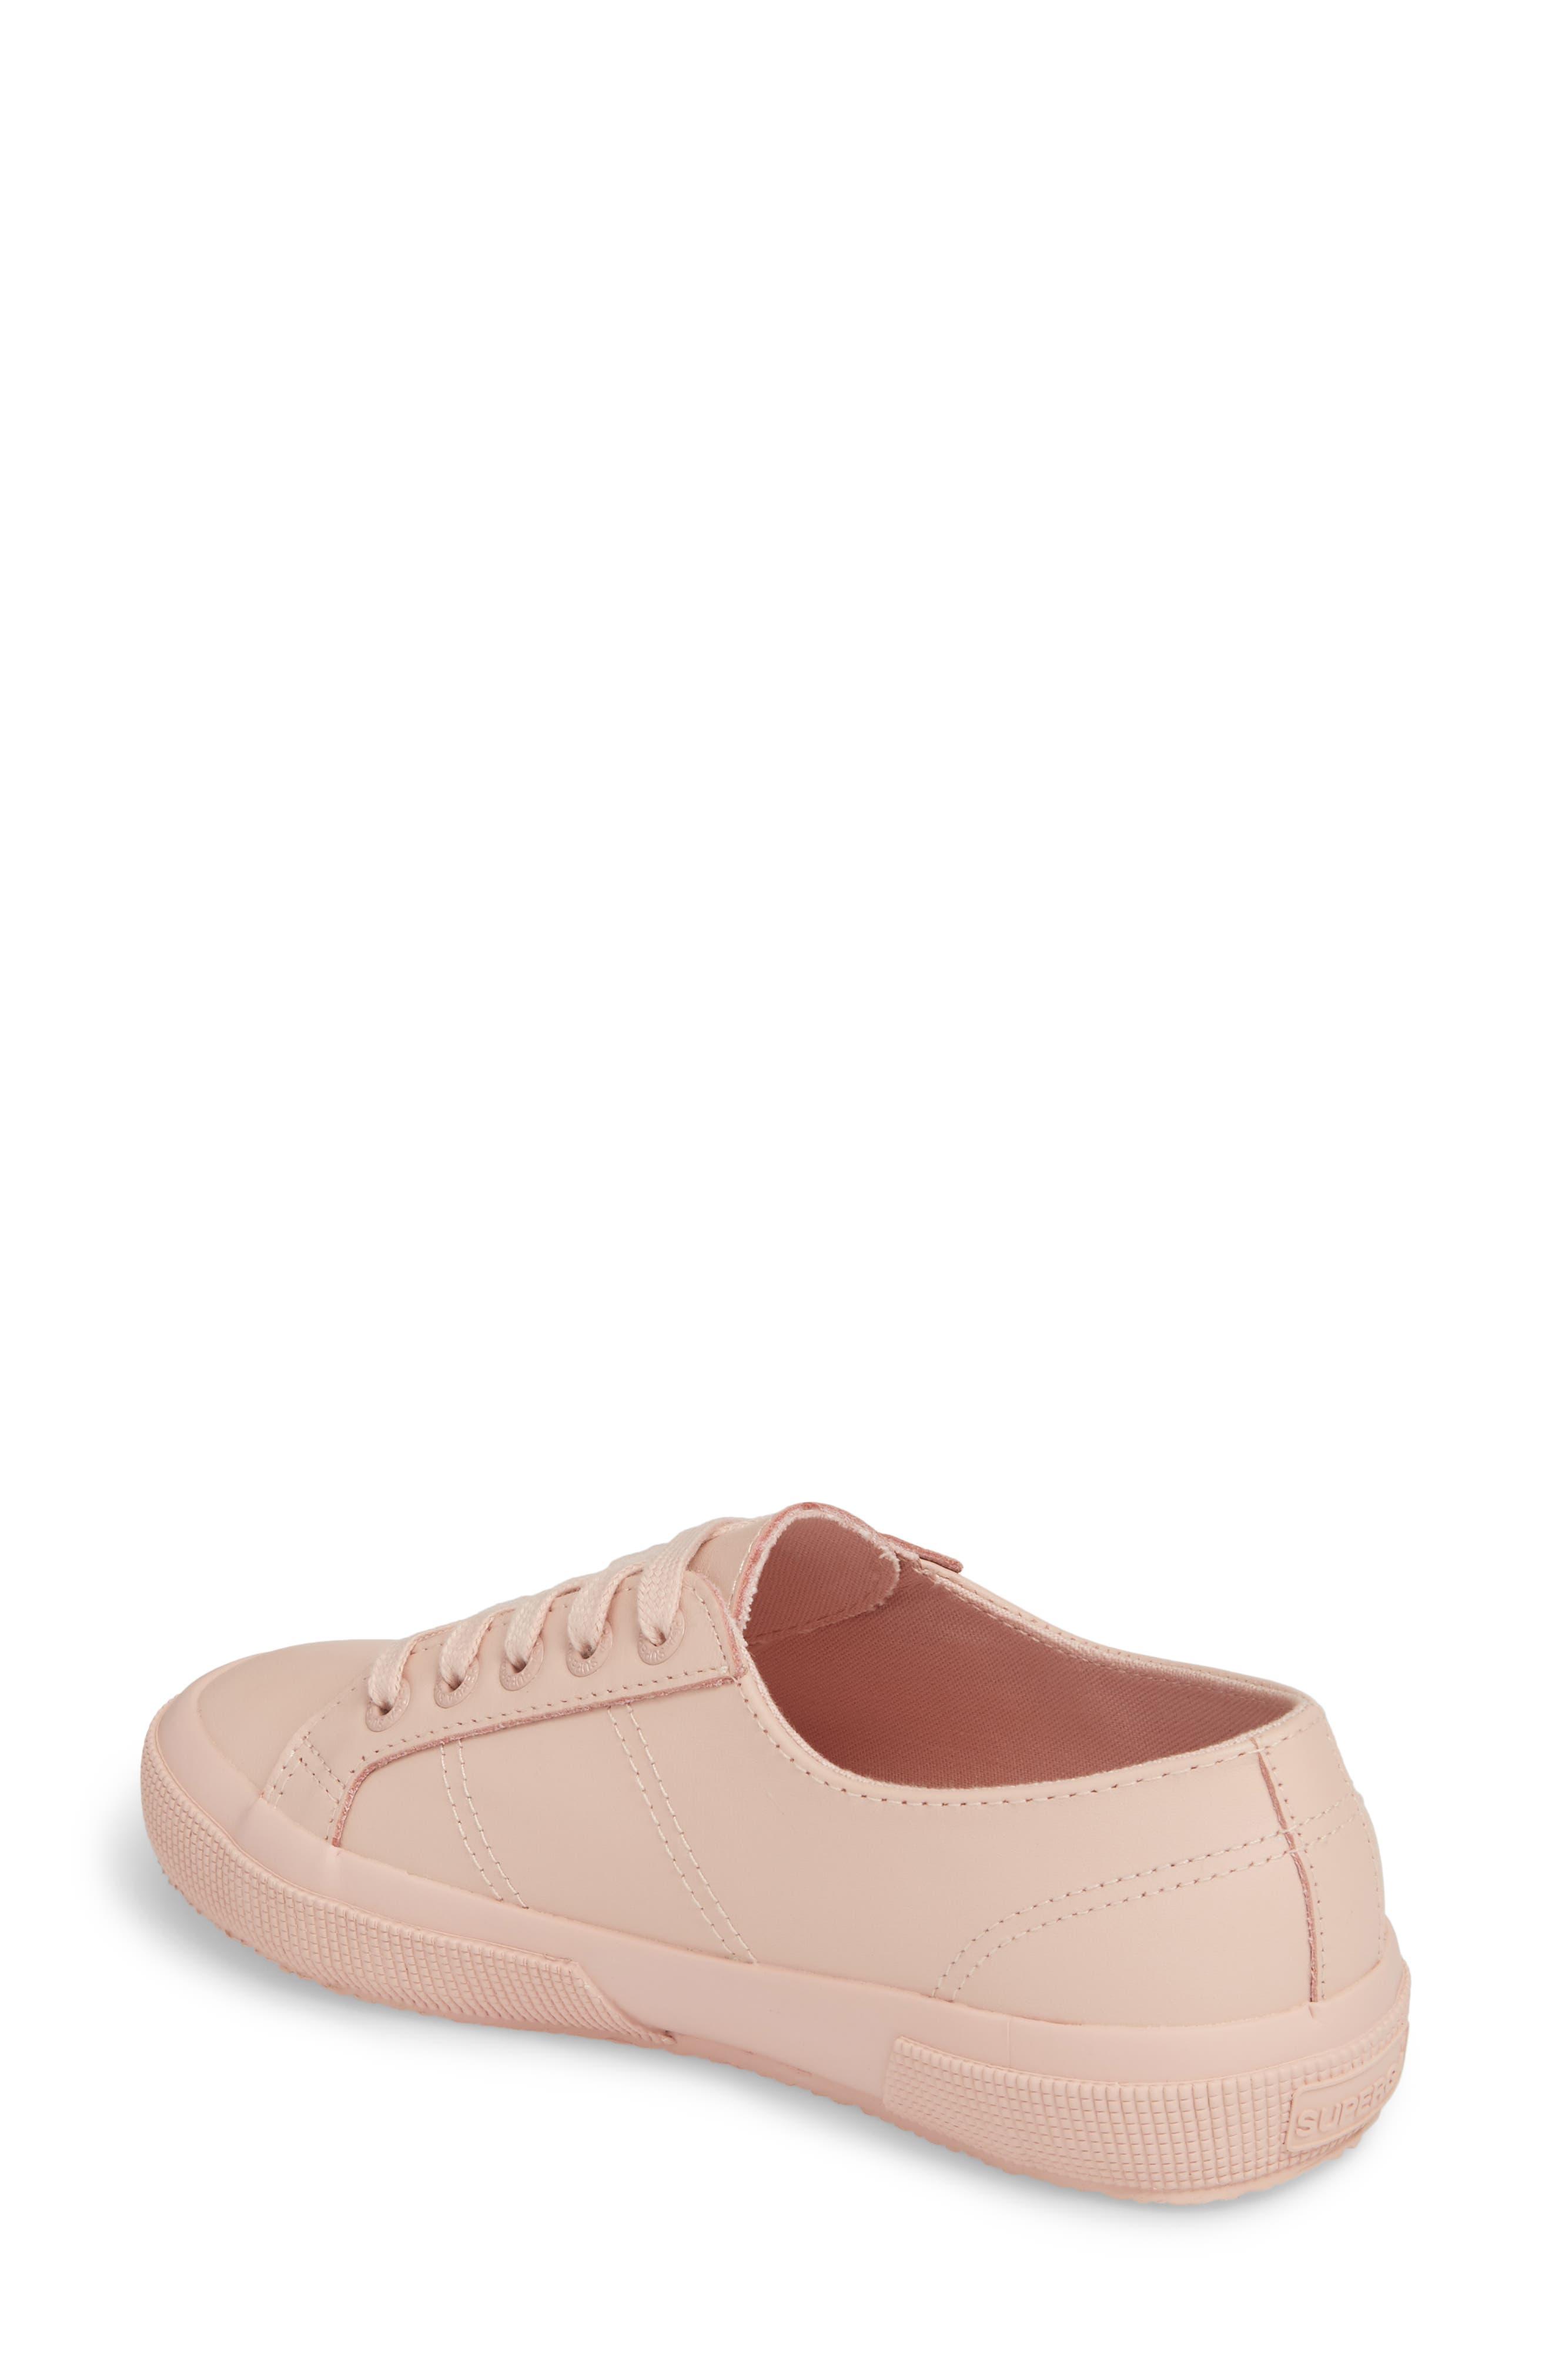 Alternate Image 2  - Superga '2750' Sneaker (Women)